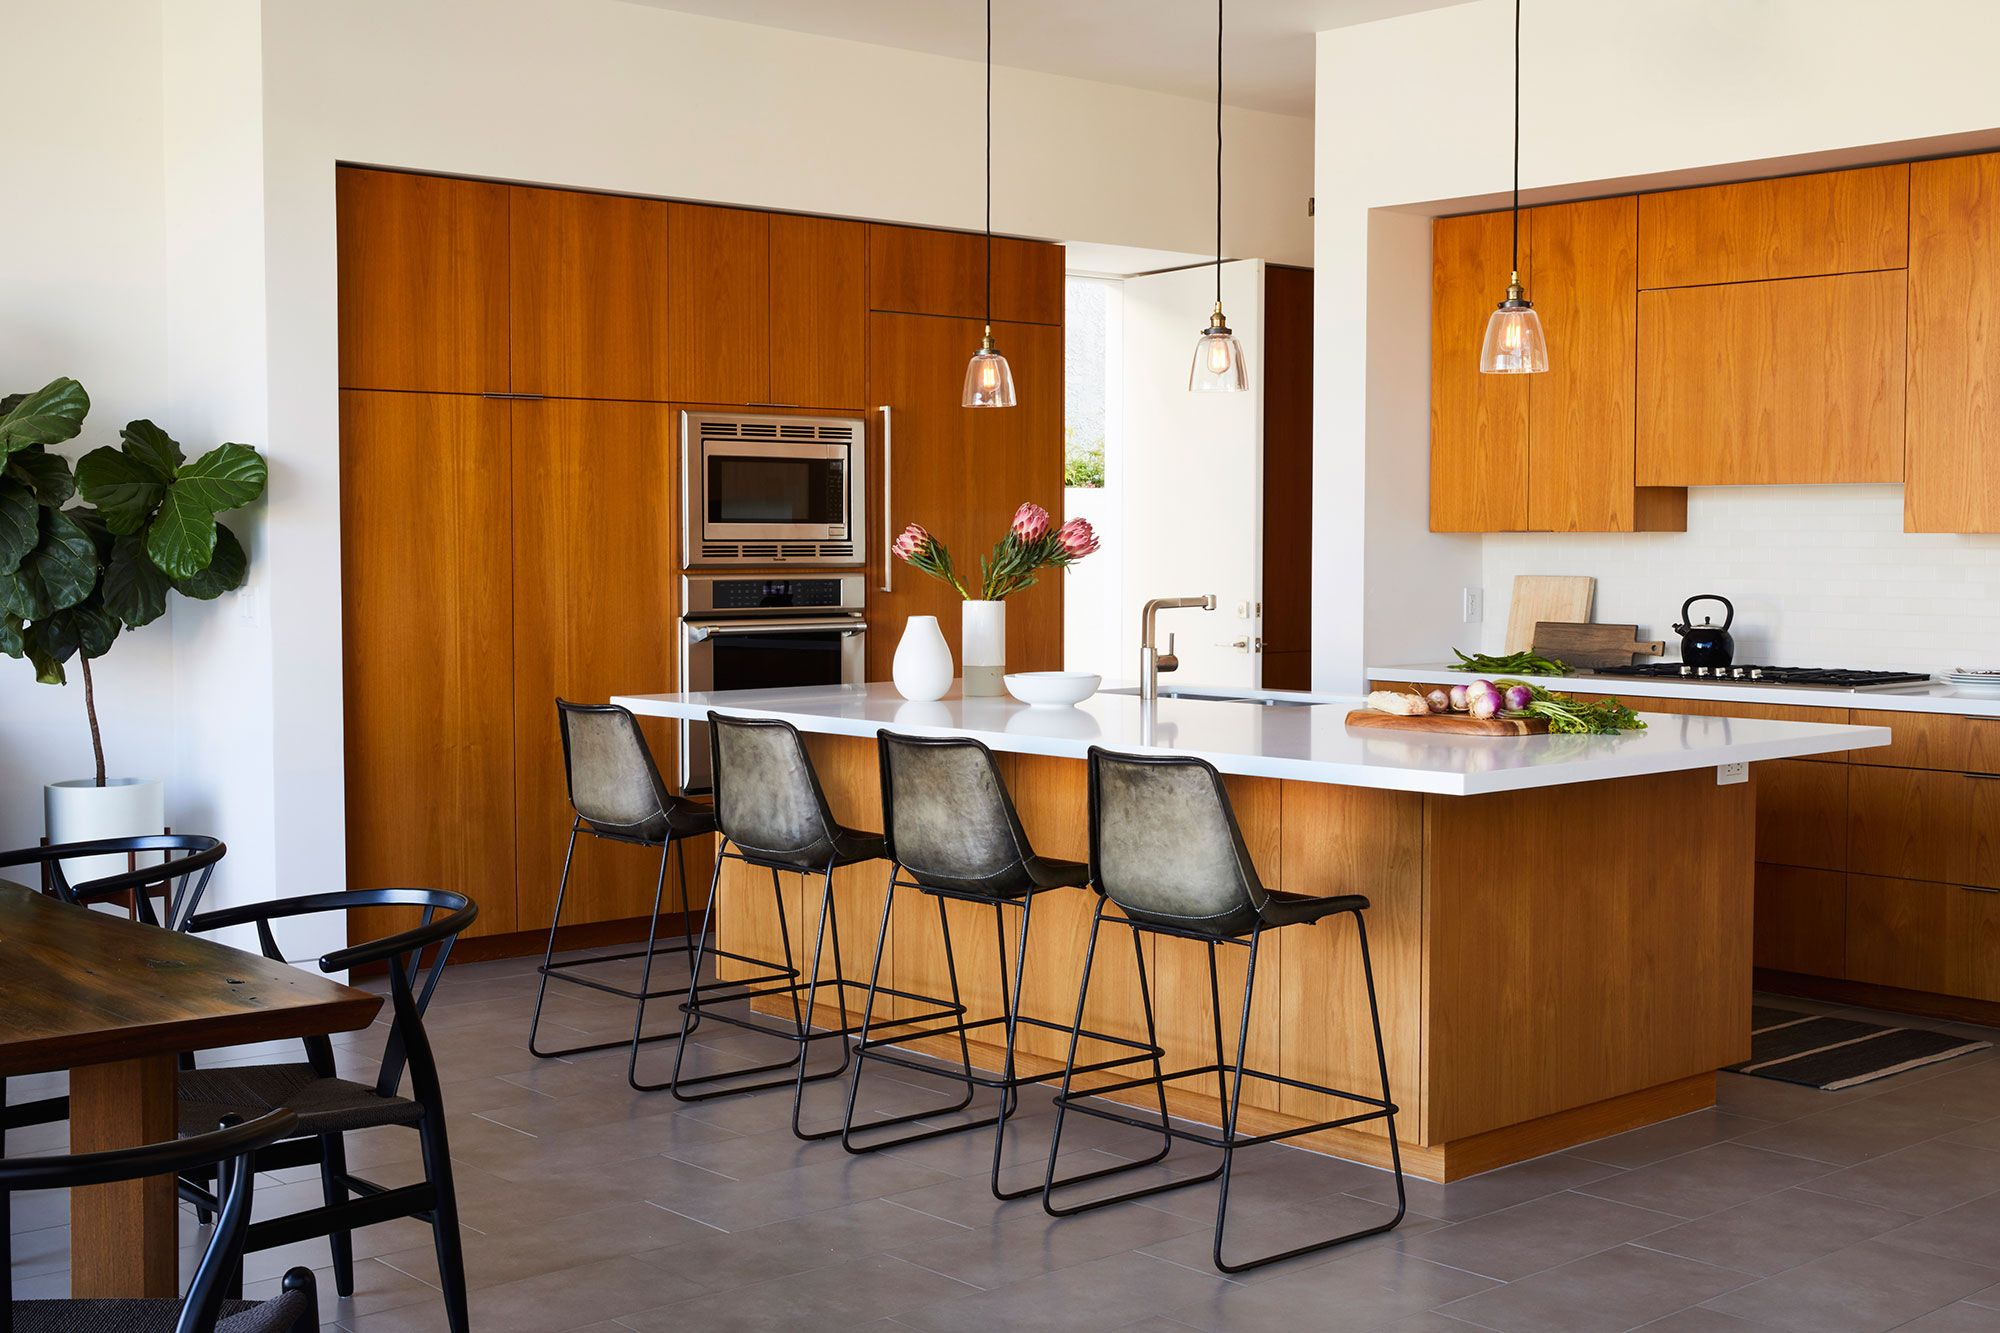 10 Modern Cabinet Ideas Thatu0027ll Freshen Up Your Kitchen & 10 Best Modern Kitchen Cabinet Ideas - Chic Modern Cabinet Design